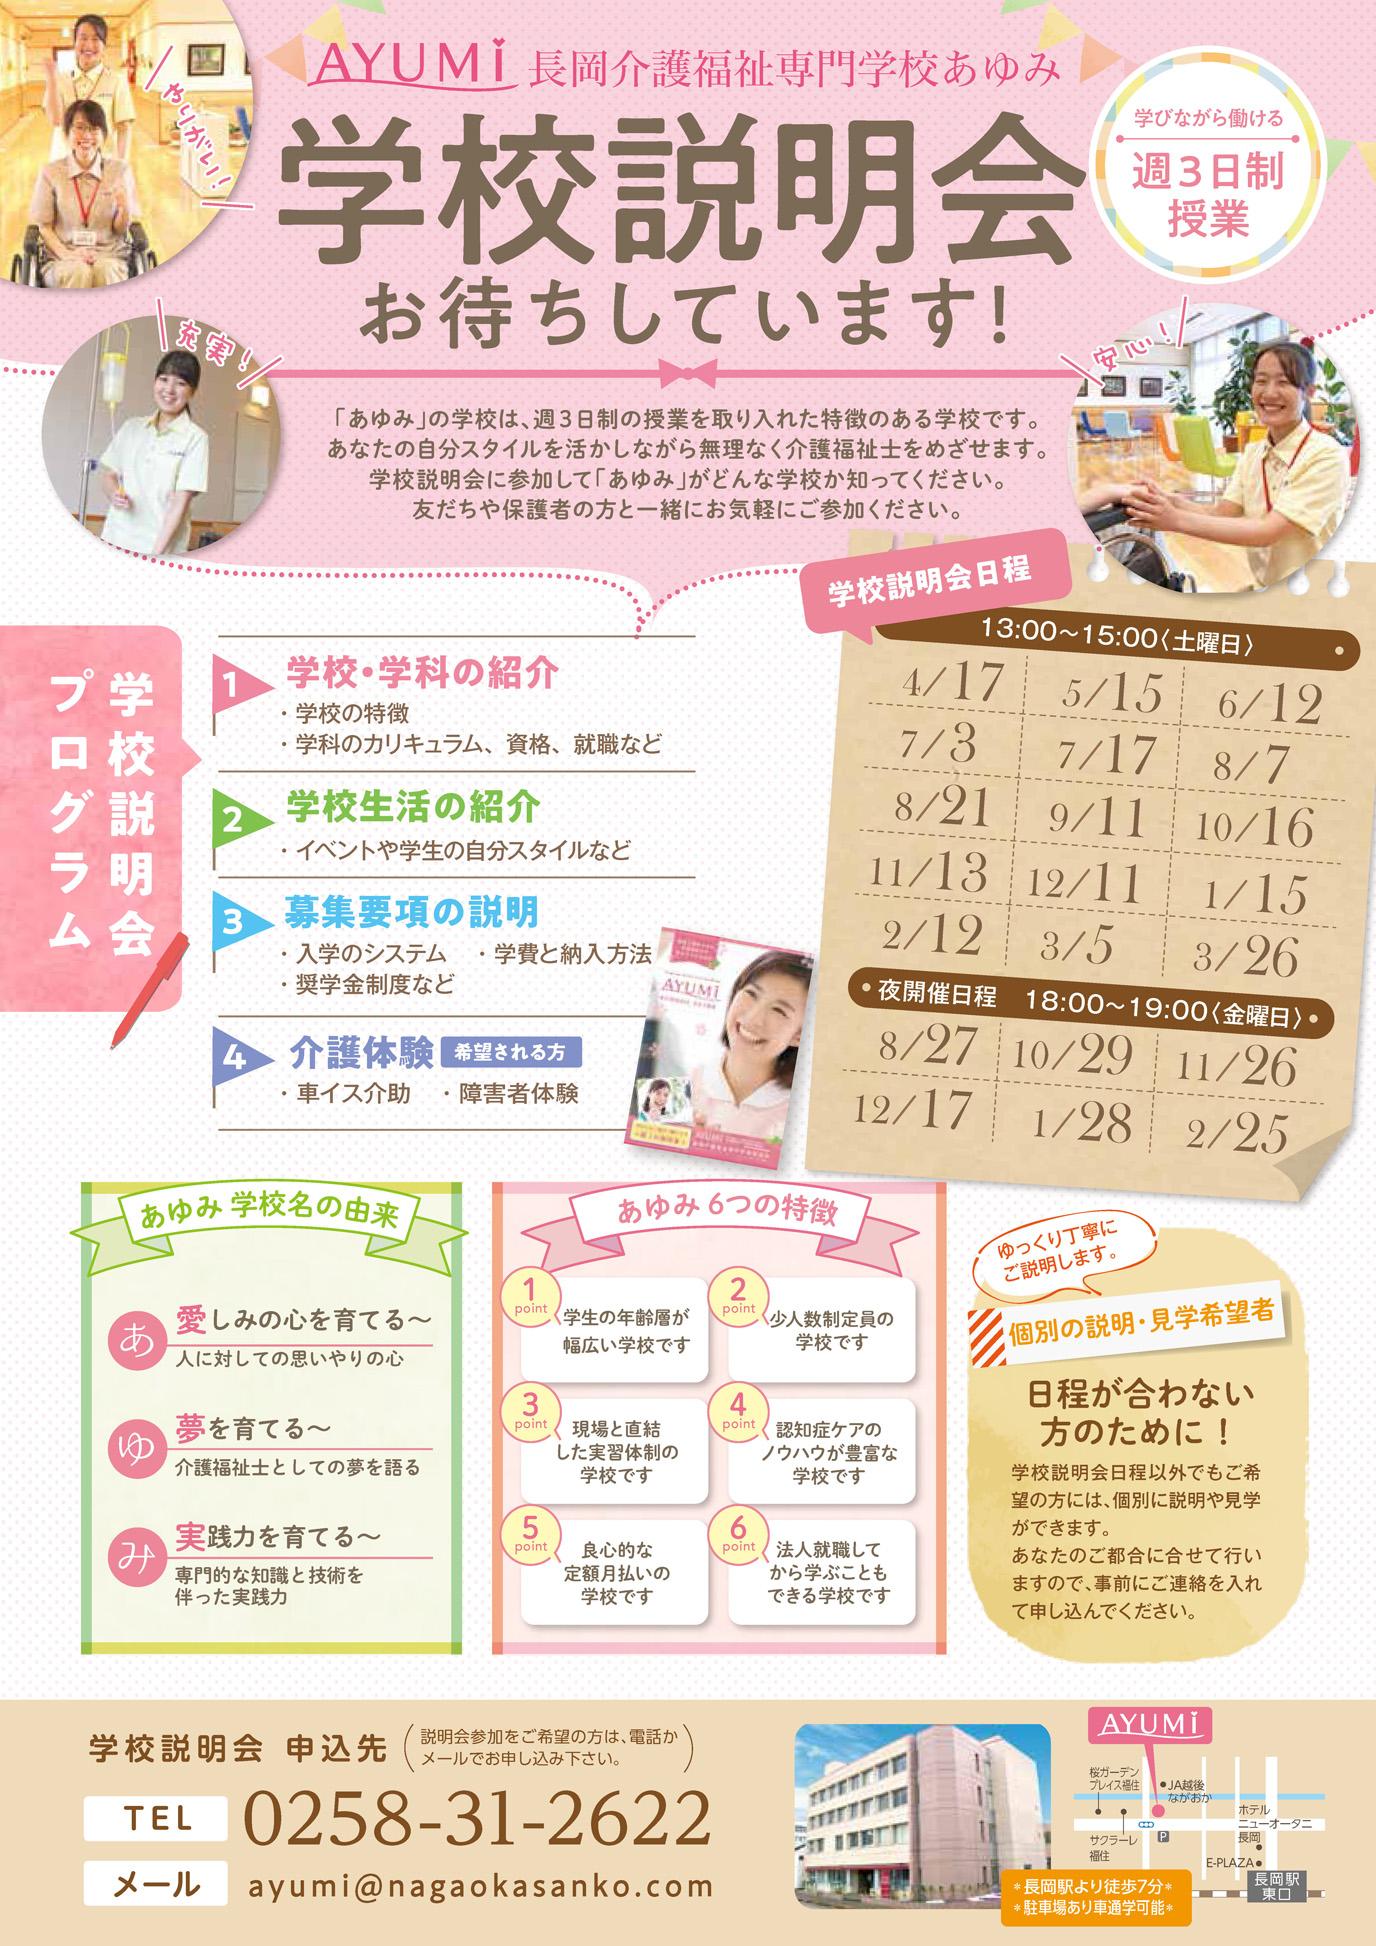 学校説明会開催|長岡介護福祉専門学校あゆみ